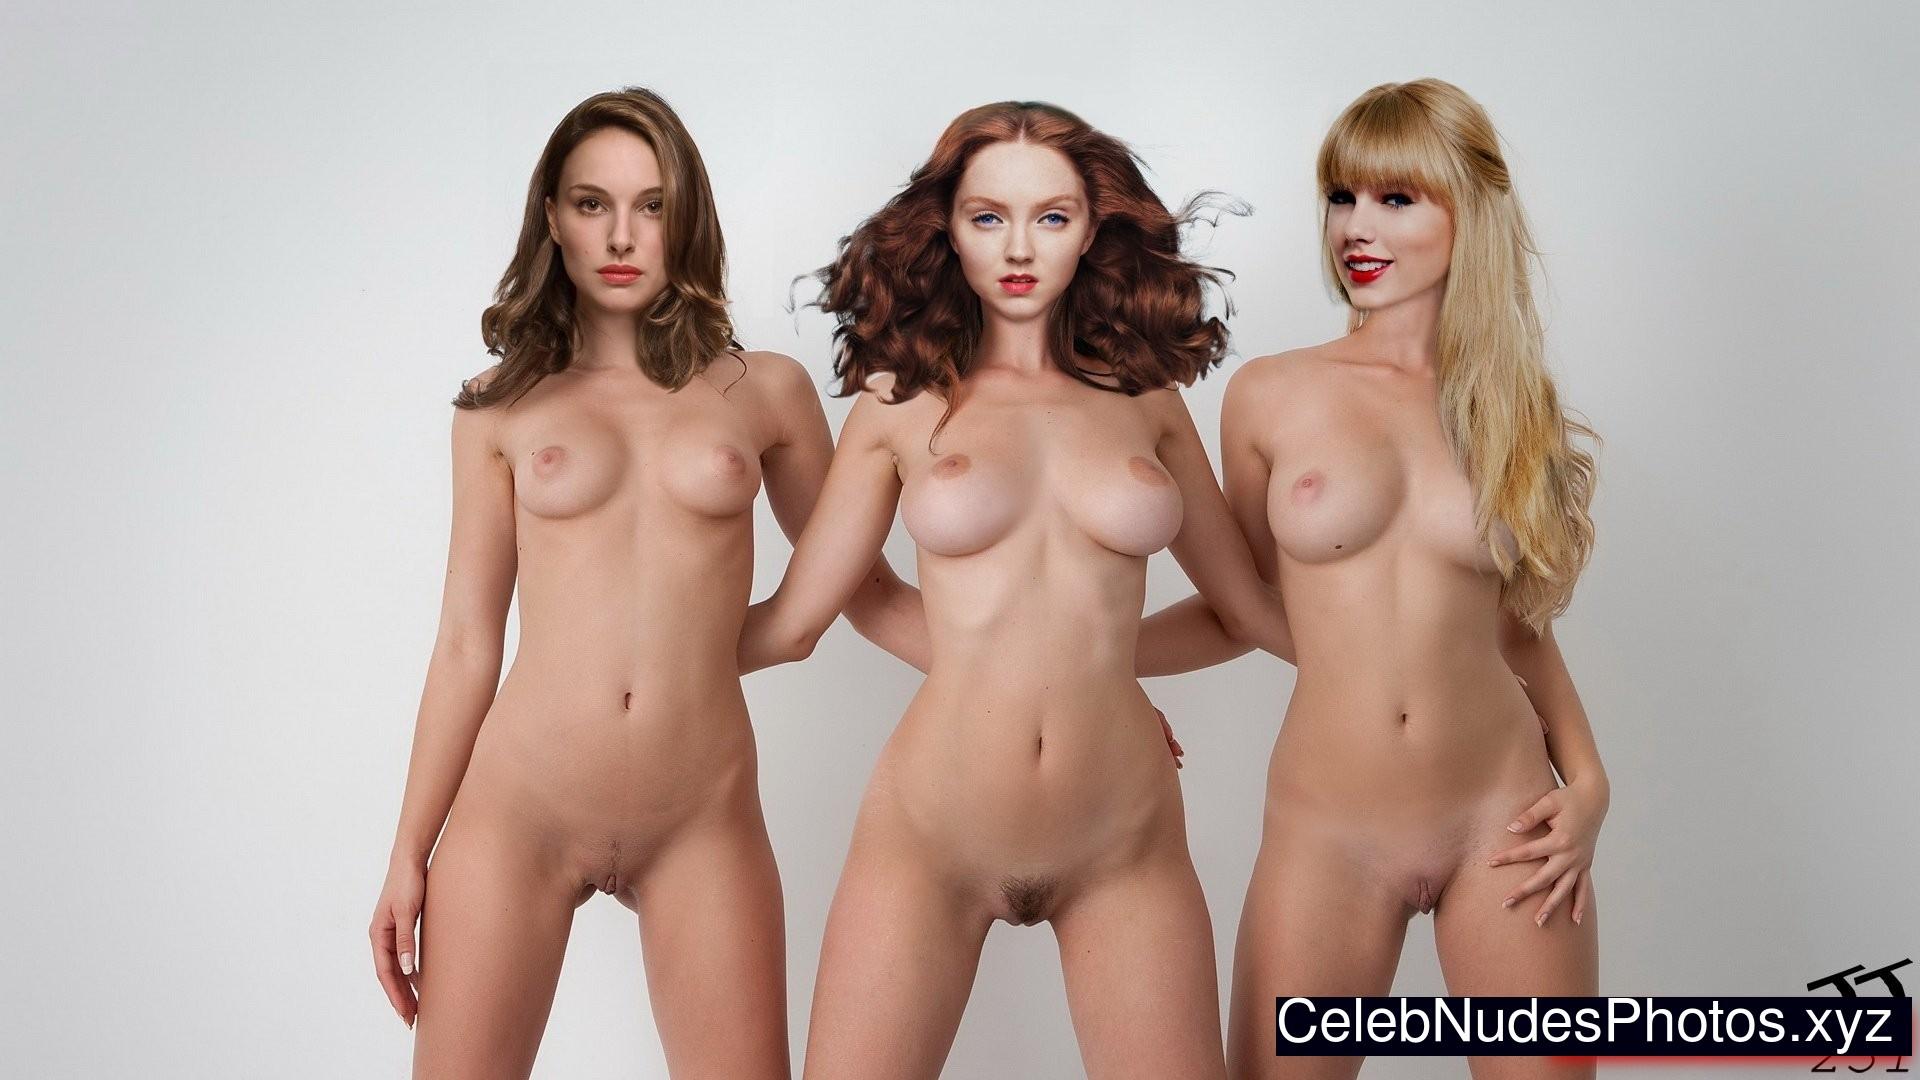 Natalie Portman celeb nudes